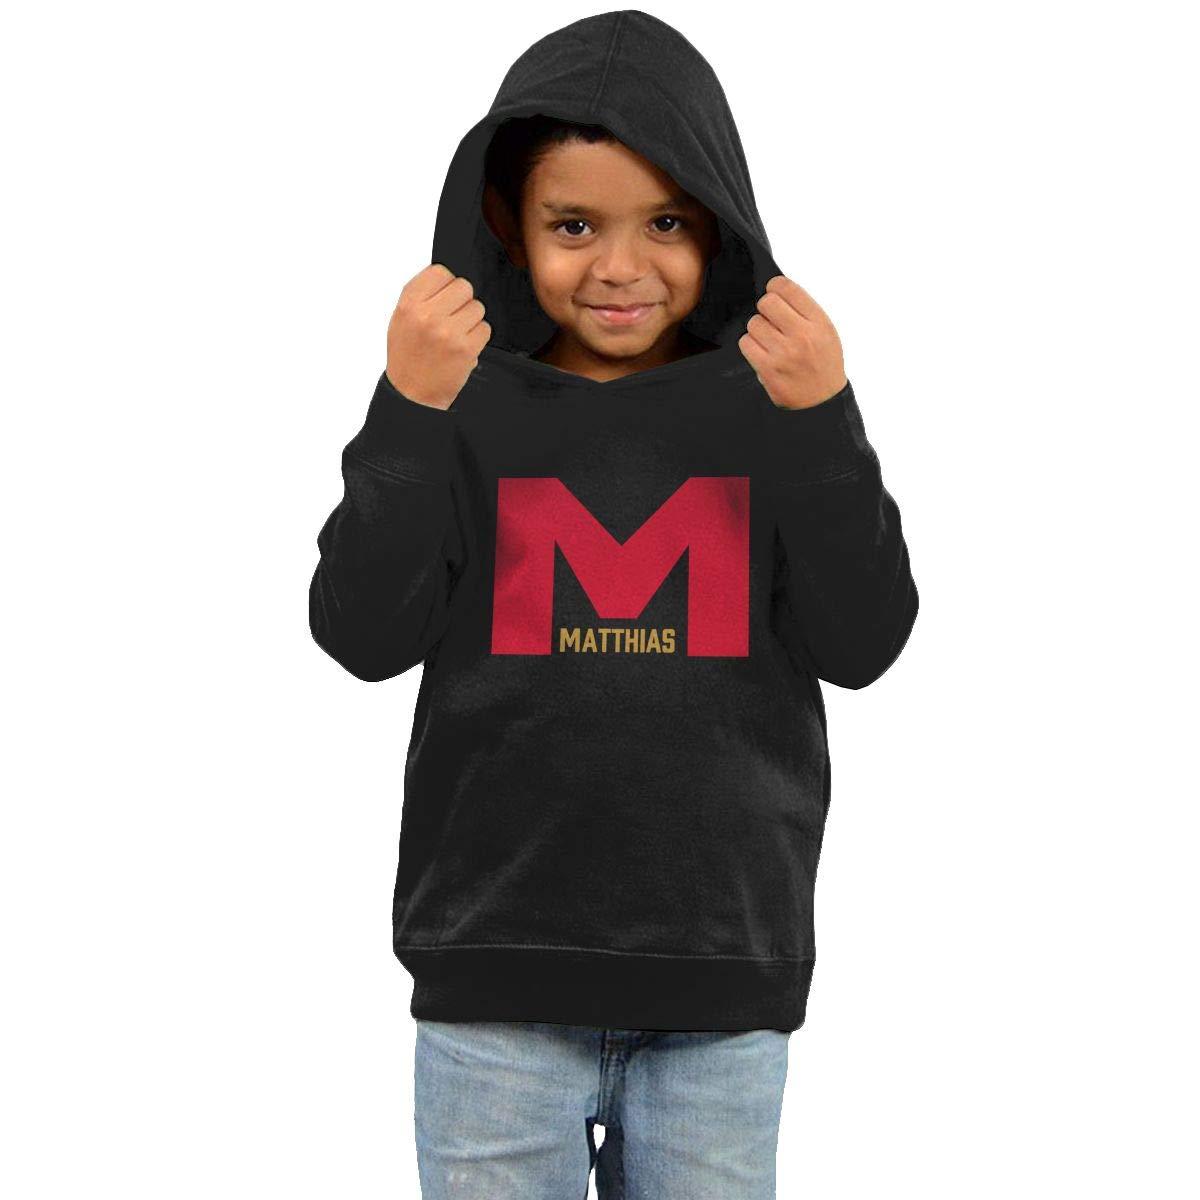 Stacy J. Payne Toddler Matthias Fashion Hoodies41 Black